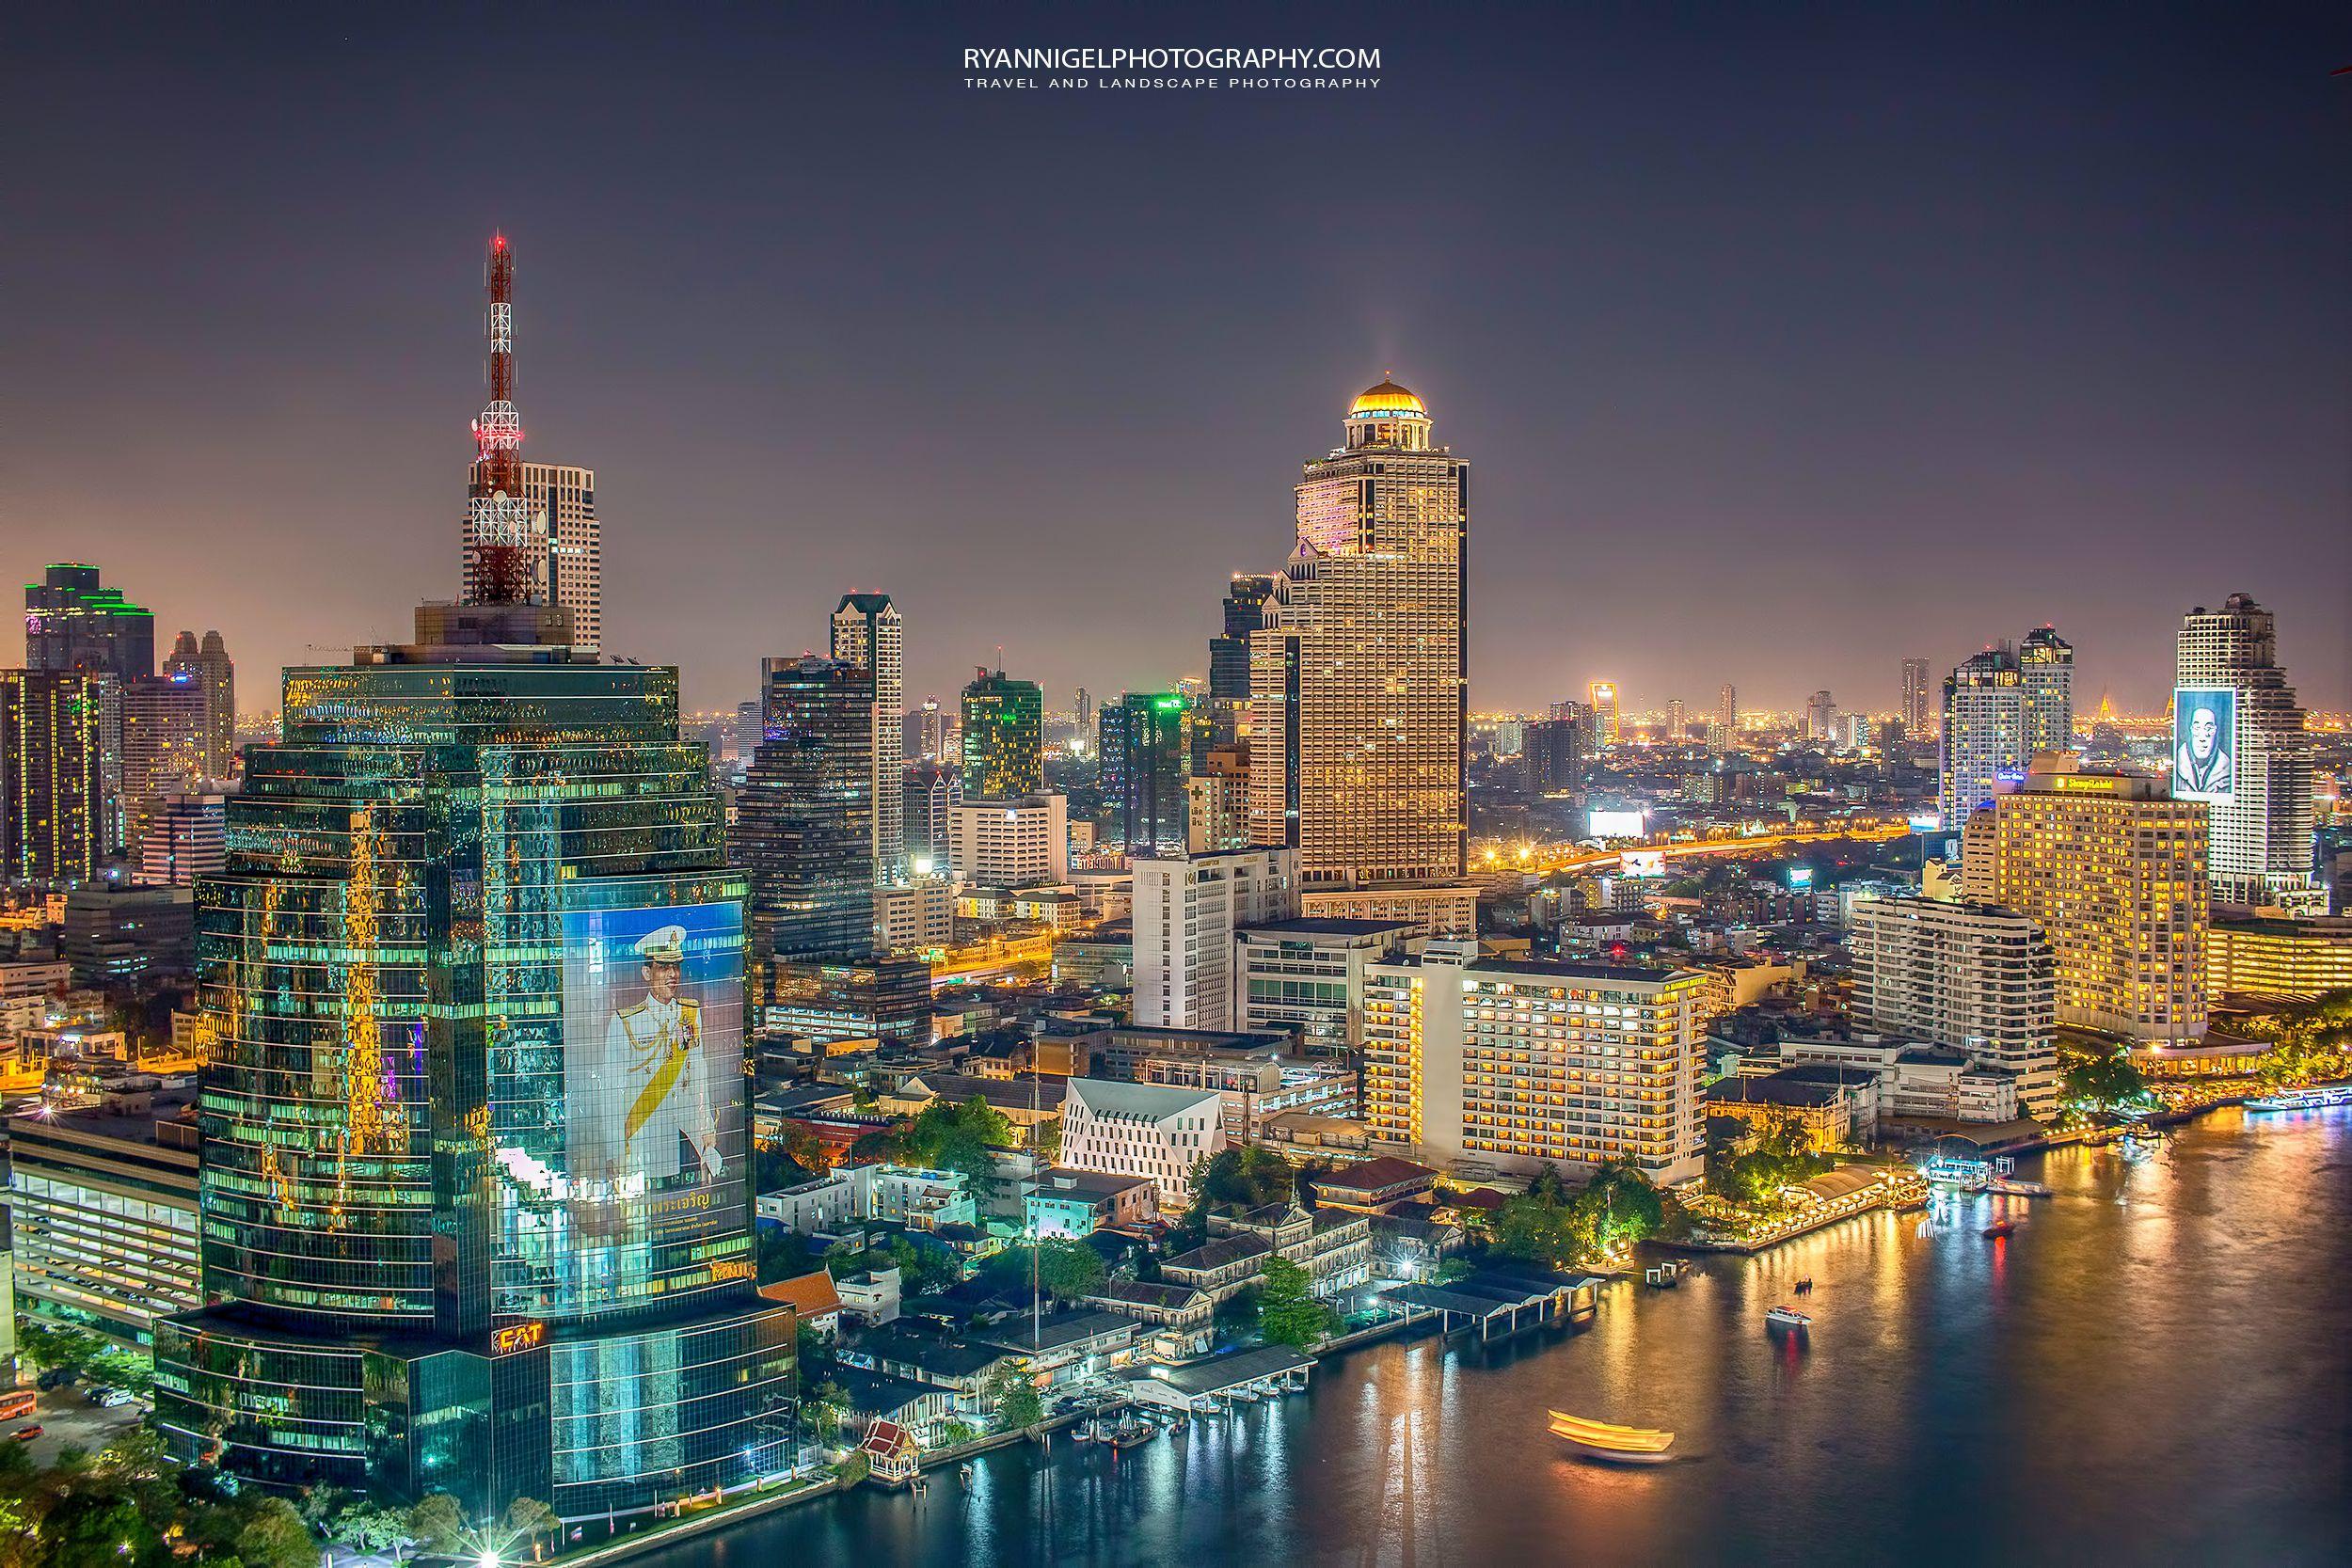 Bangkok At Night In 2020 Landscape Photography Cityscape Travel